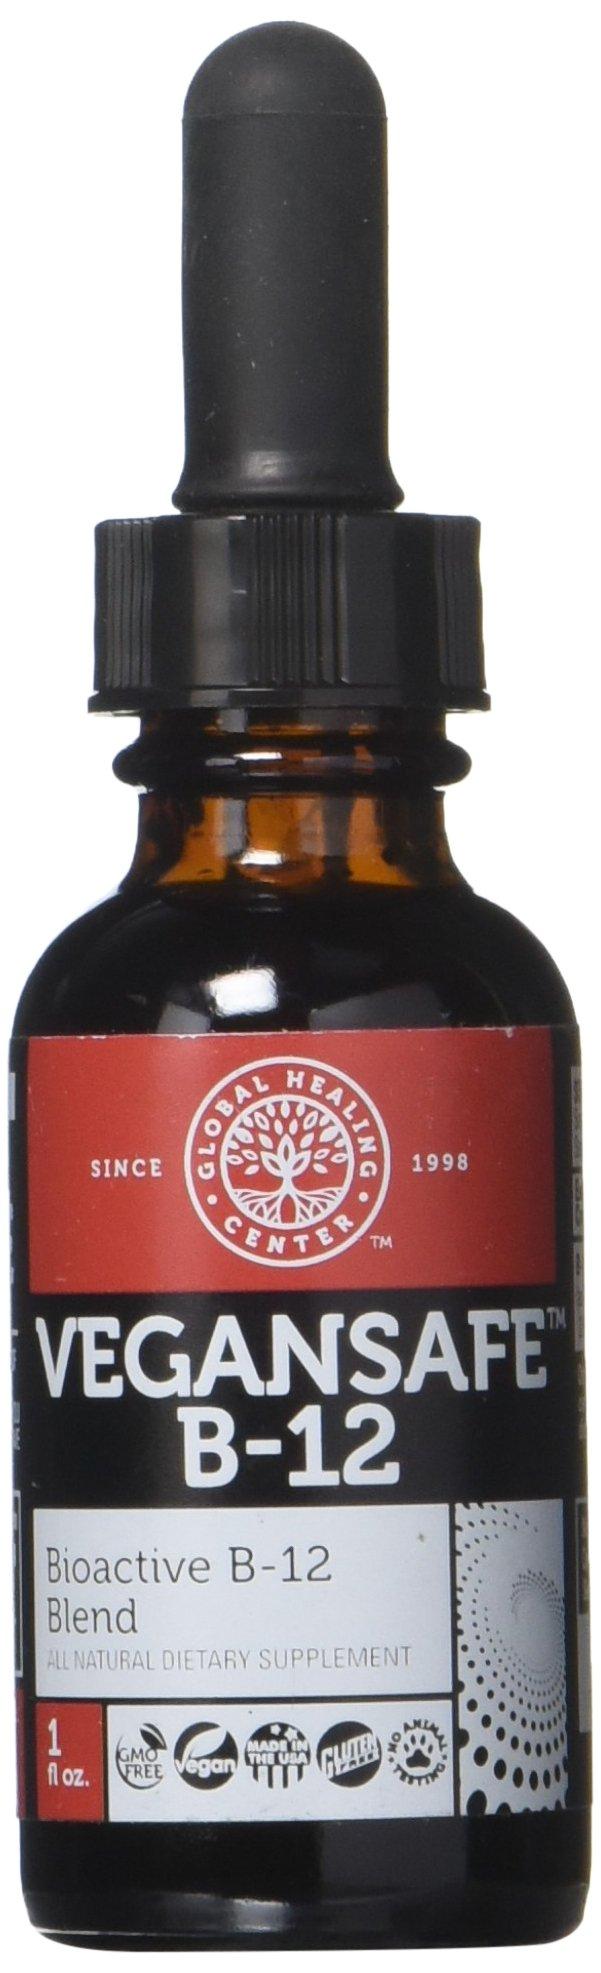 VeganSafe B-12 - Organic Liquid Vegan Vitamin B12 Methylcobalamin Adenosylcobalamin Supplement by Global Healing Center - 2,500 Mcg (1 Ounce)